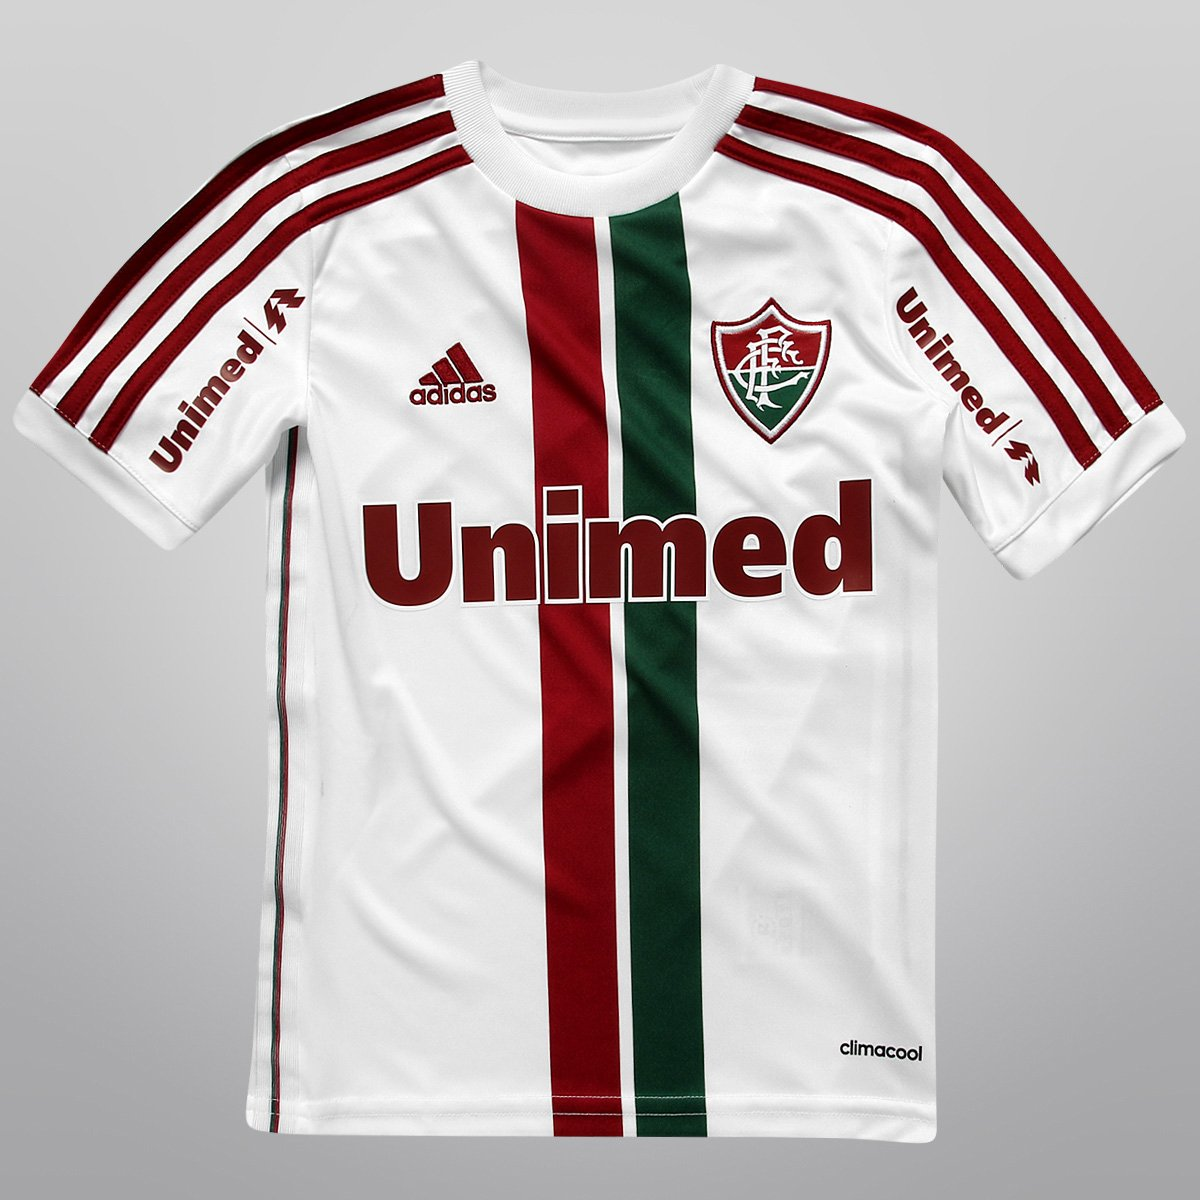 Camisa Adidas Fluminense II 14 15 s nº Infantil - Compre Agora ... e729a90d66c77